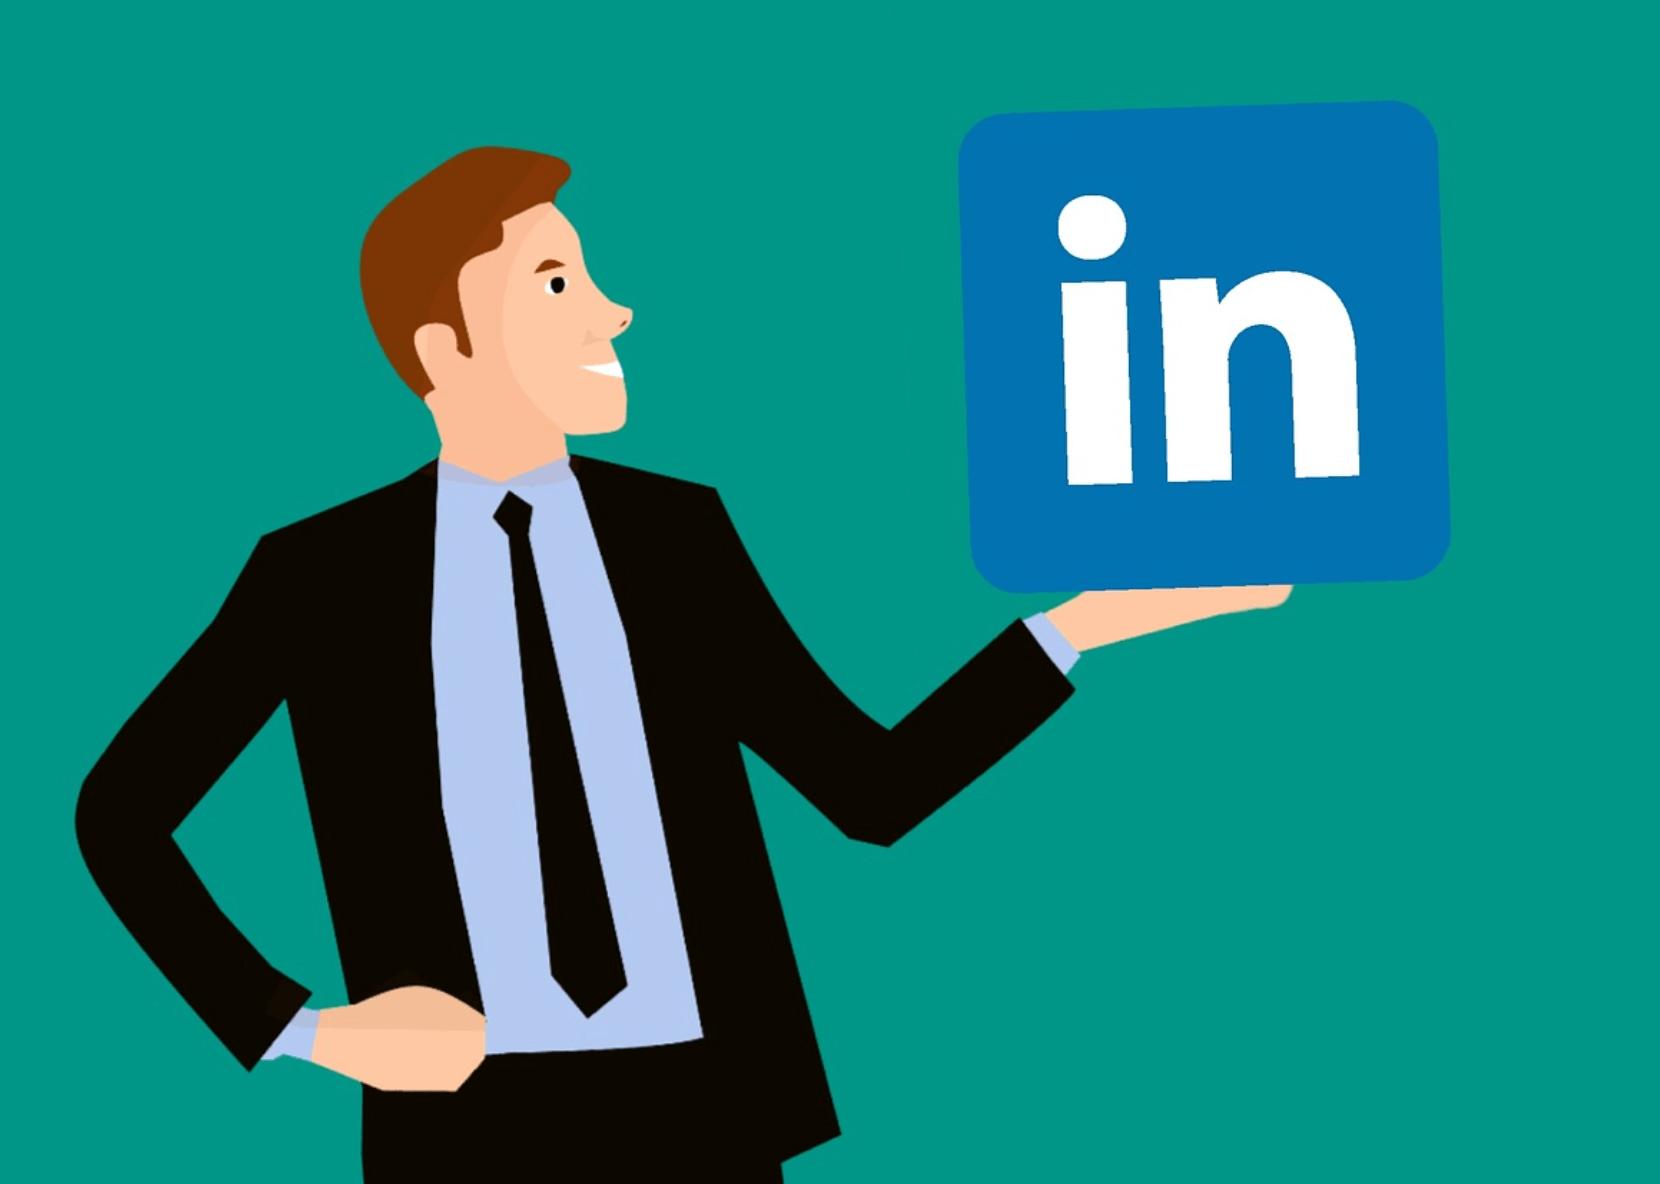 Cartoon man with the LinkedIn logo in hand.